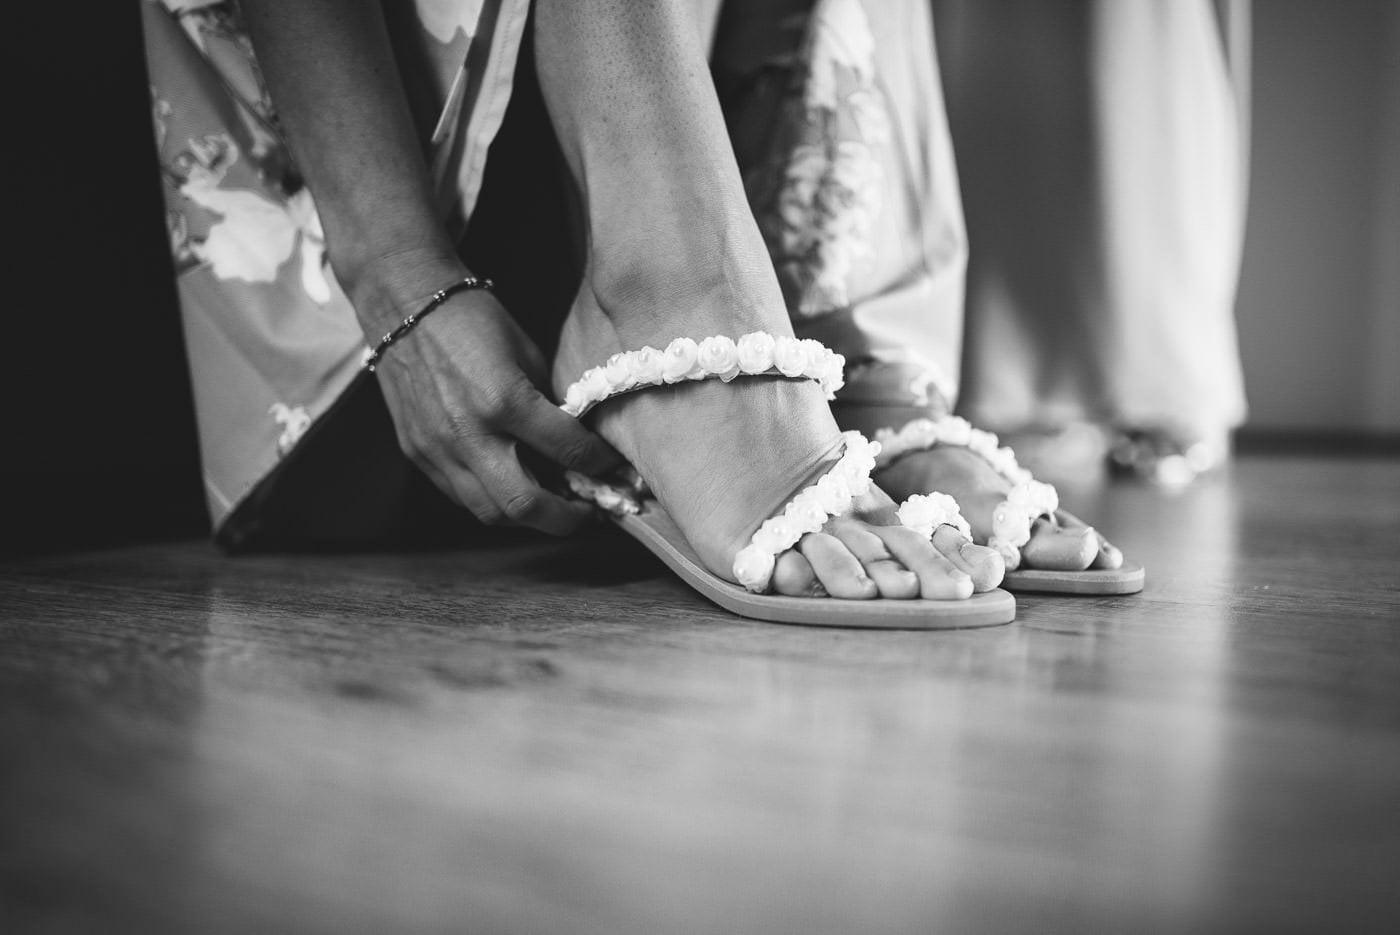 Matrimonio Giulia & Federico 09_15 – Alessio Nobili Photographer-12